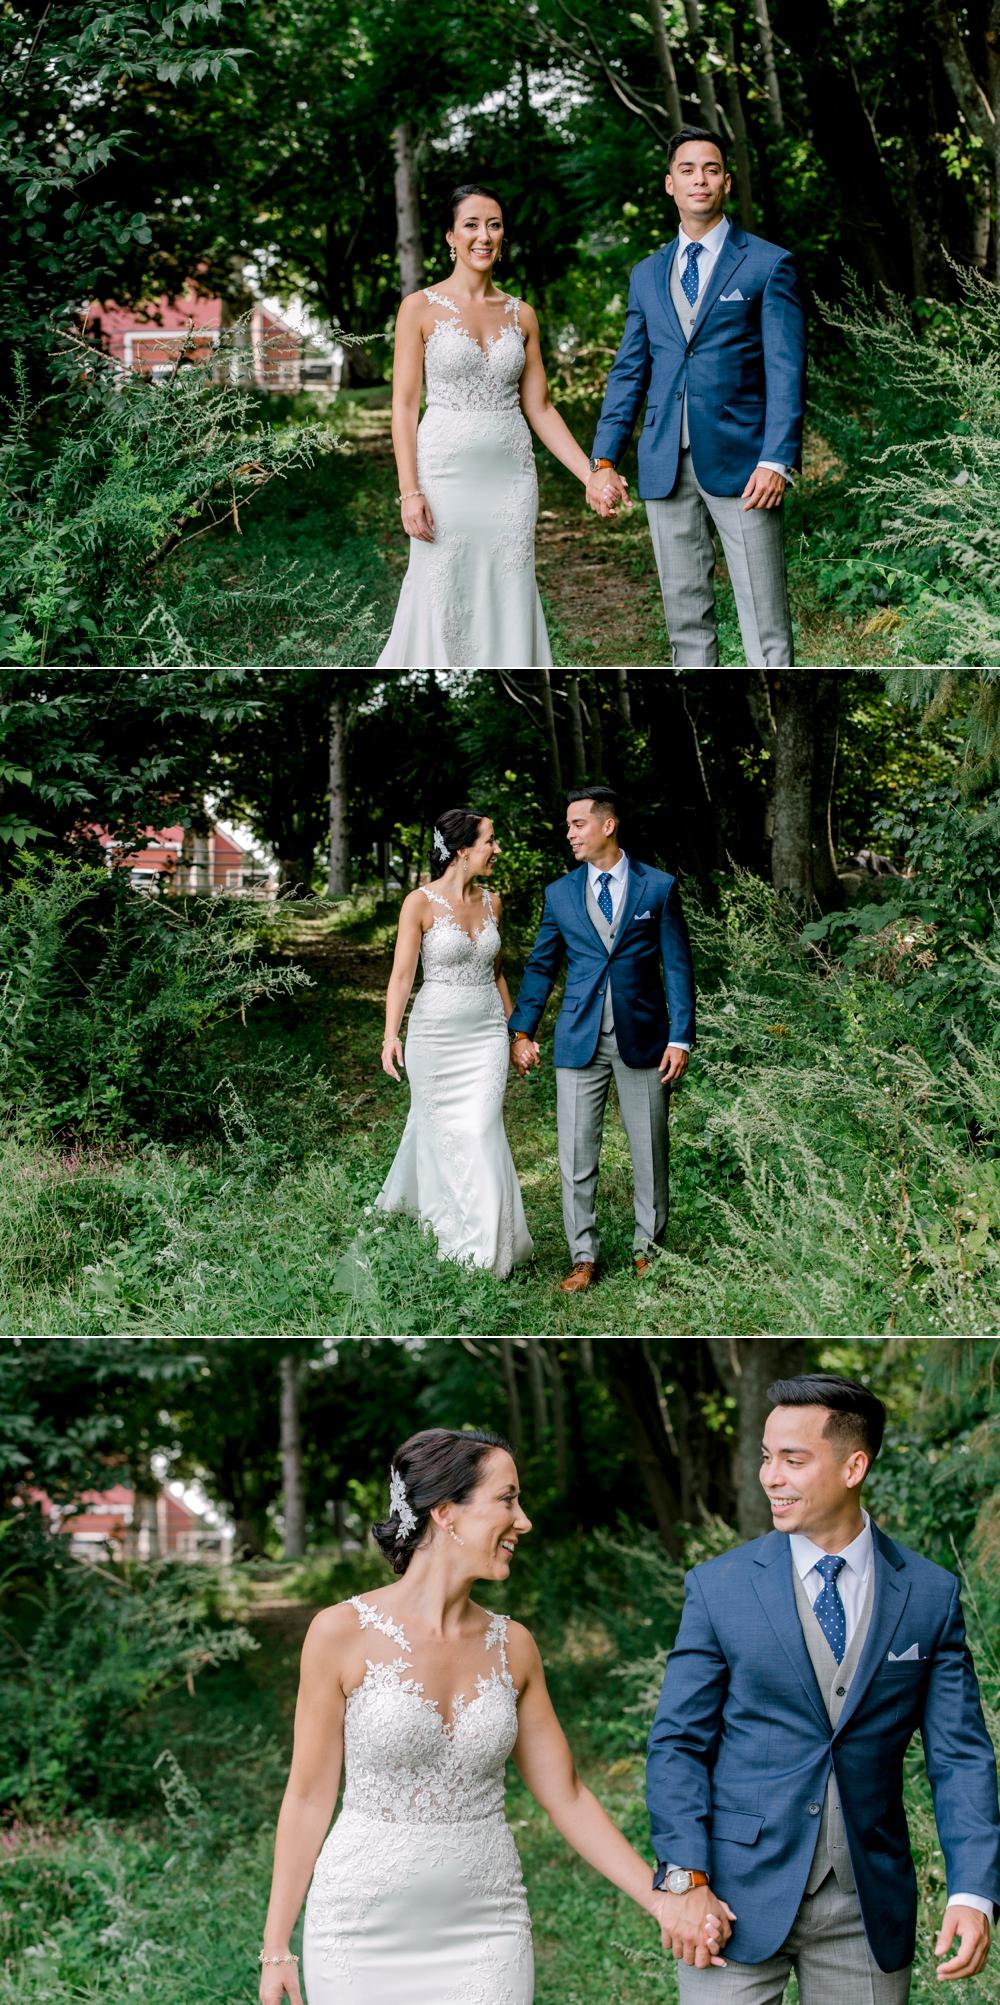 SomerbyJonesPhotography__SmithBarnWedding_SmithBarn_WeddingatSmithBarn_0018.jpg